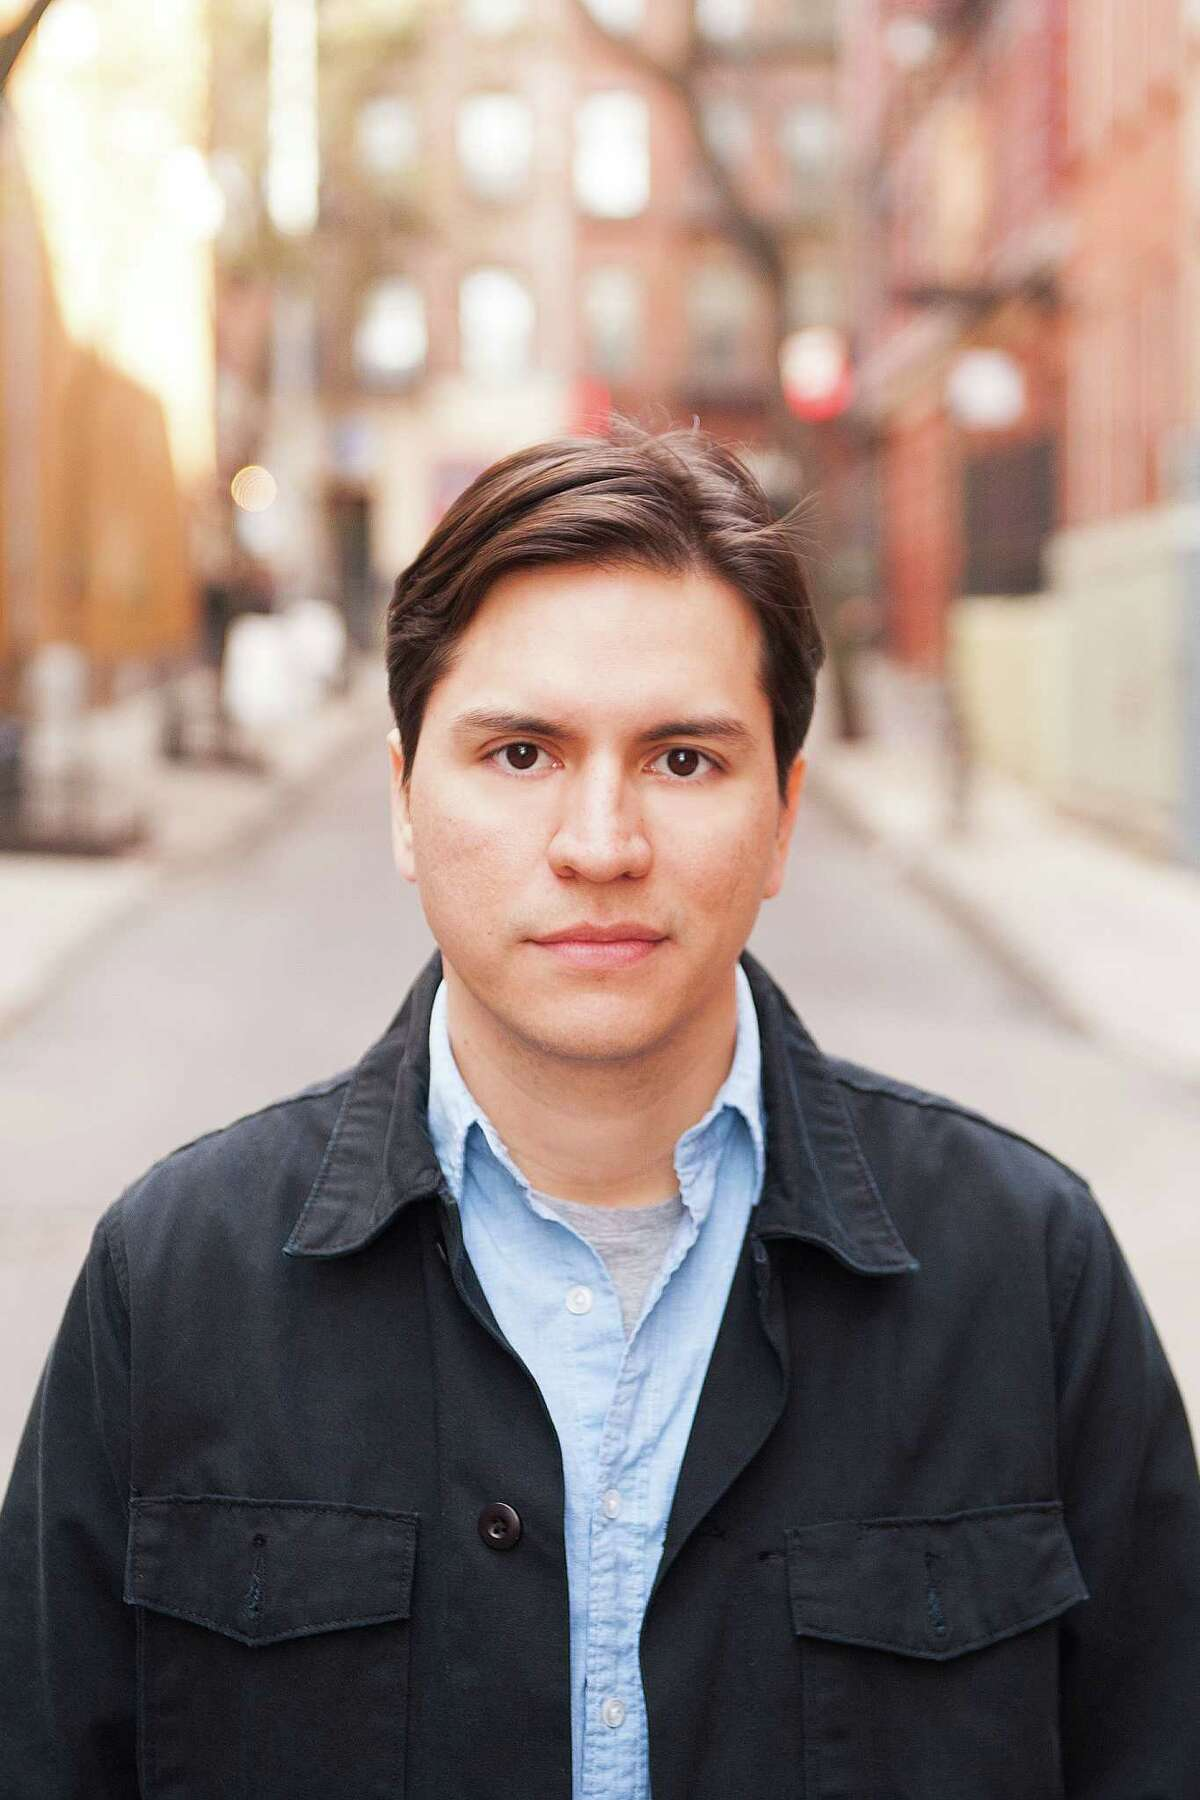 Native San Antonian Jaime Castaneda was recently named associate artistic director of the La Jolla Playhouse in California.